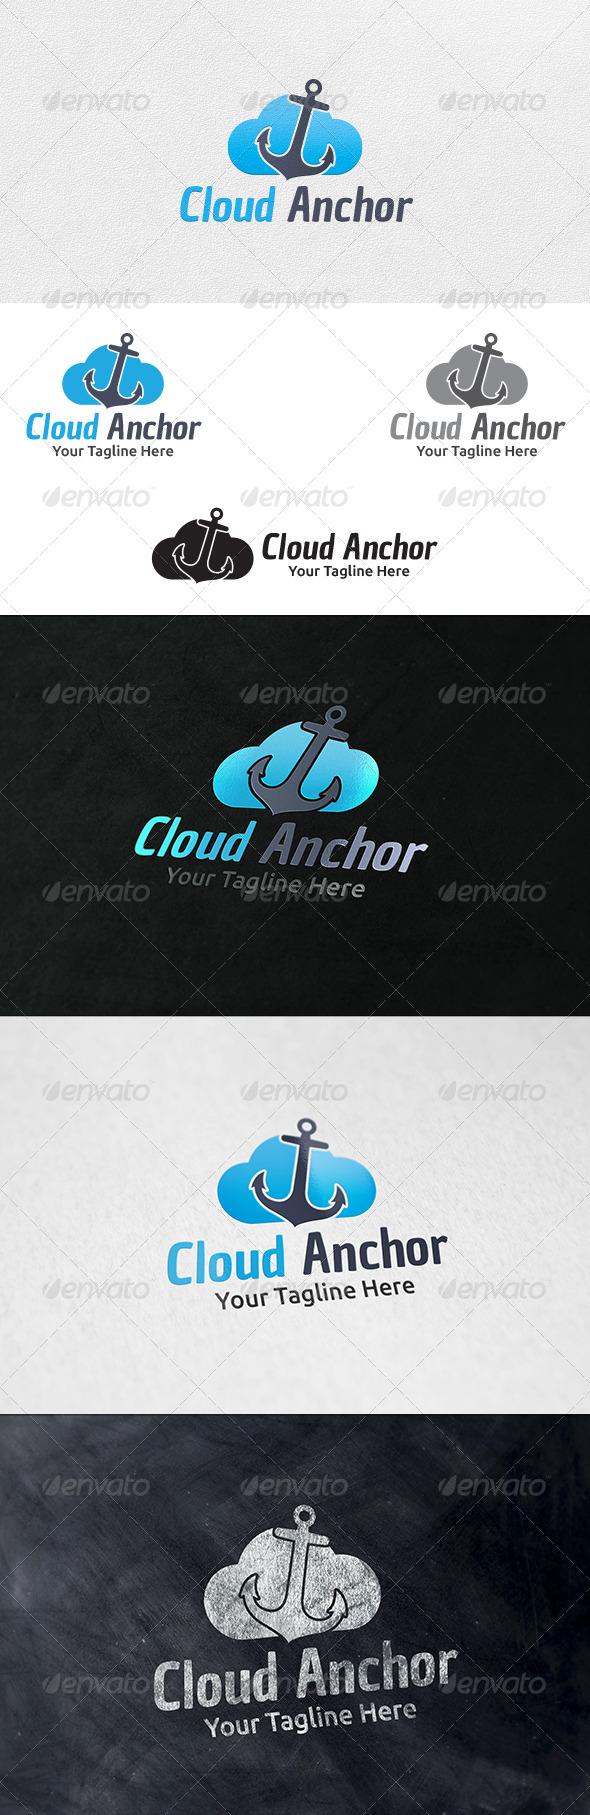 Cloud Anchor - Logo Template - Nature Logo Templates